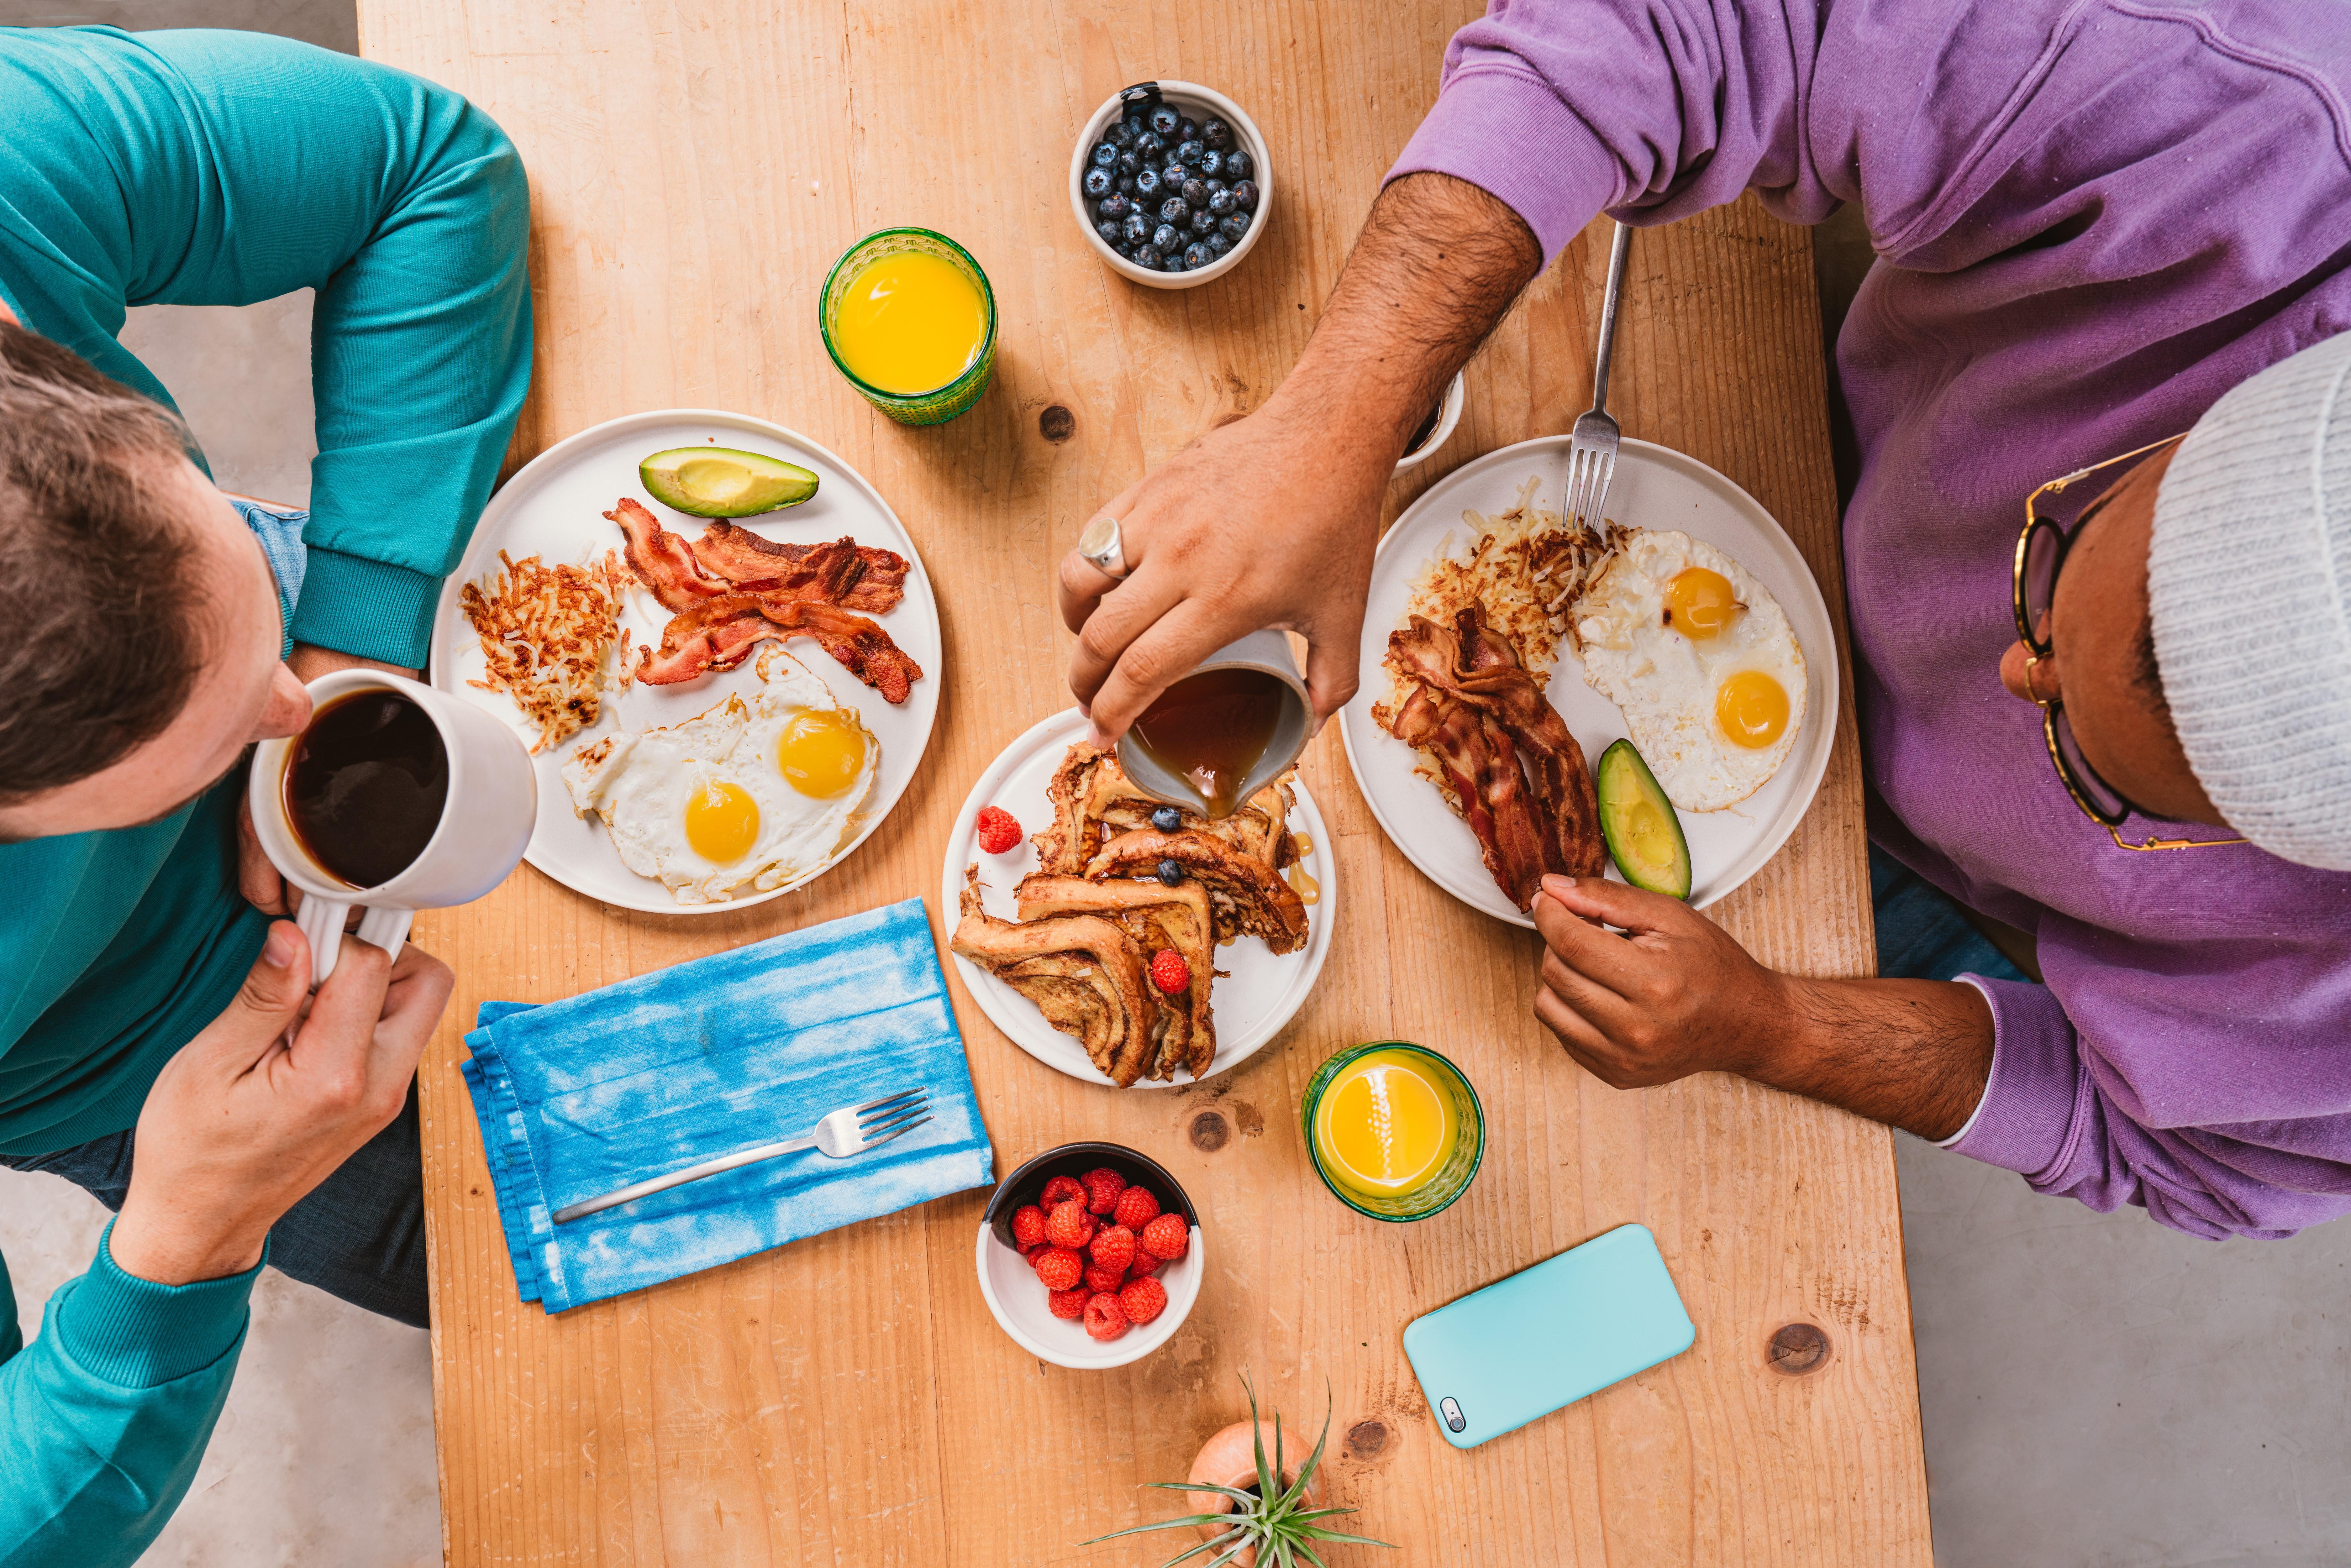 Friends eating breakfast